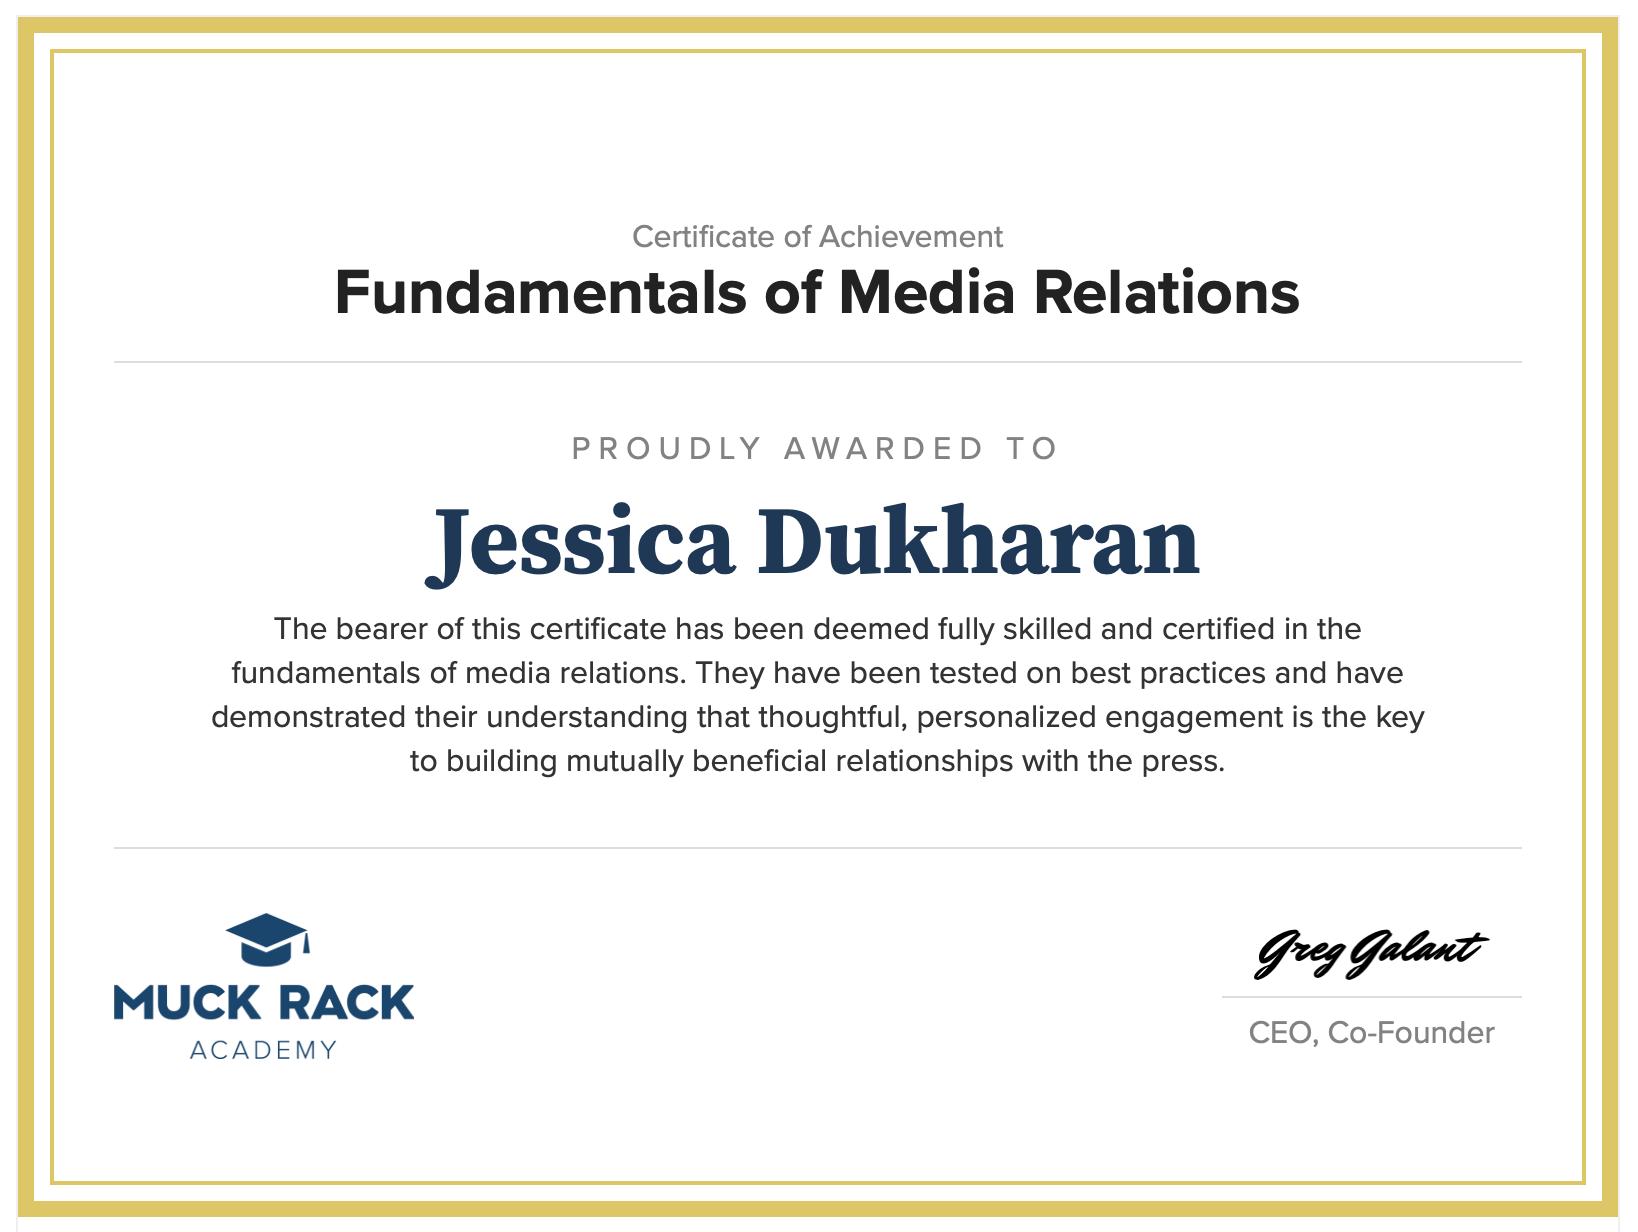 Certificate of Achievement Fundamentals of Media Relations Jessica Dukharan